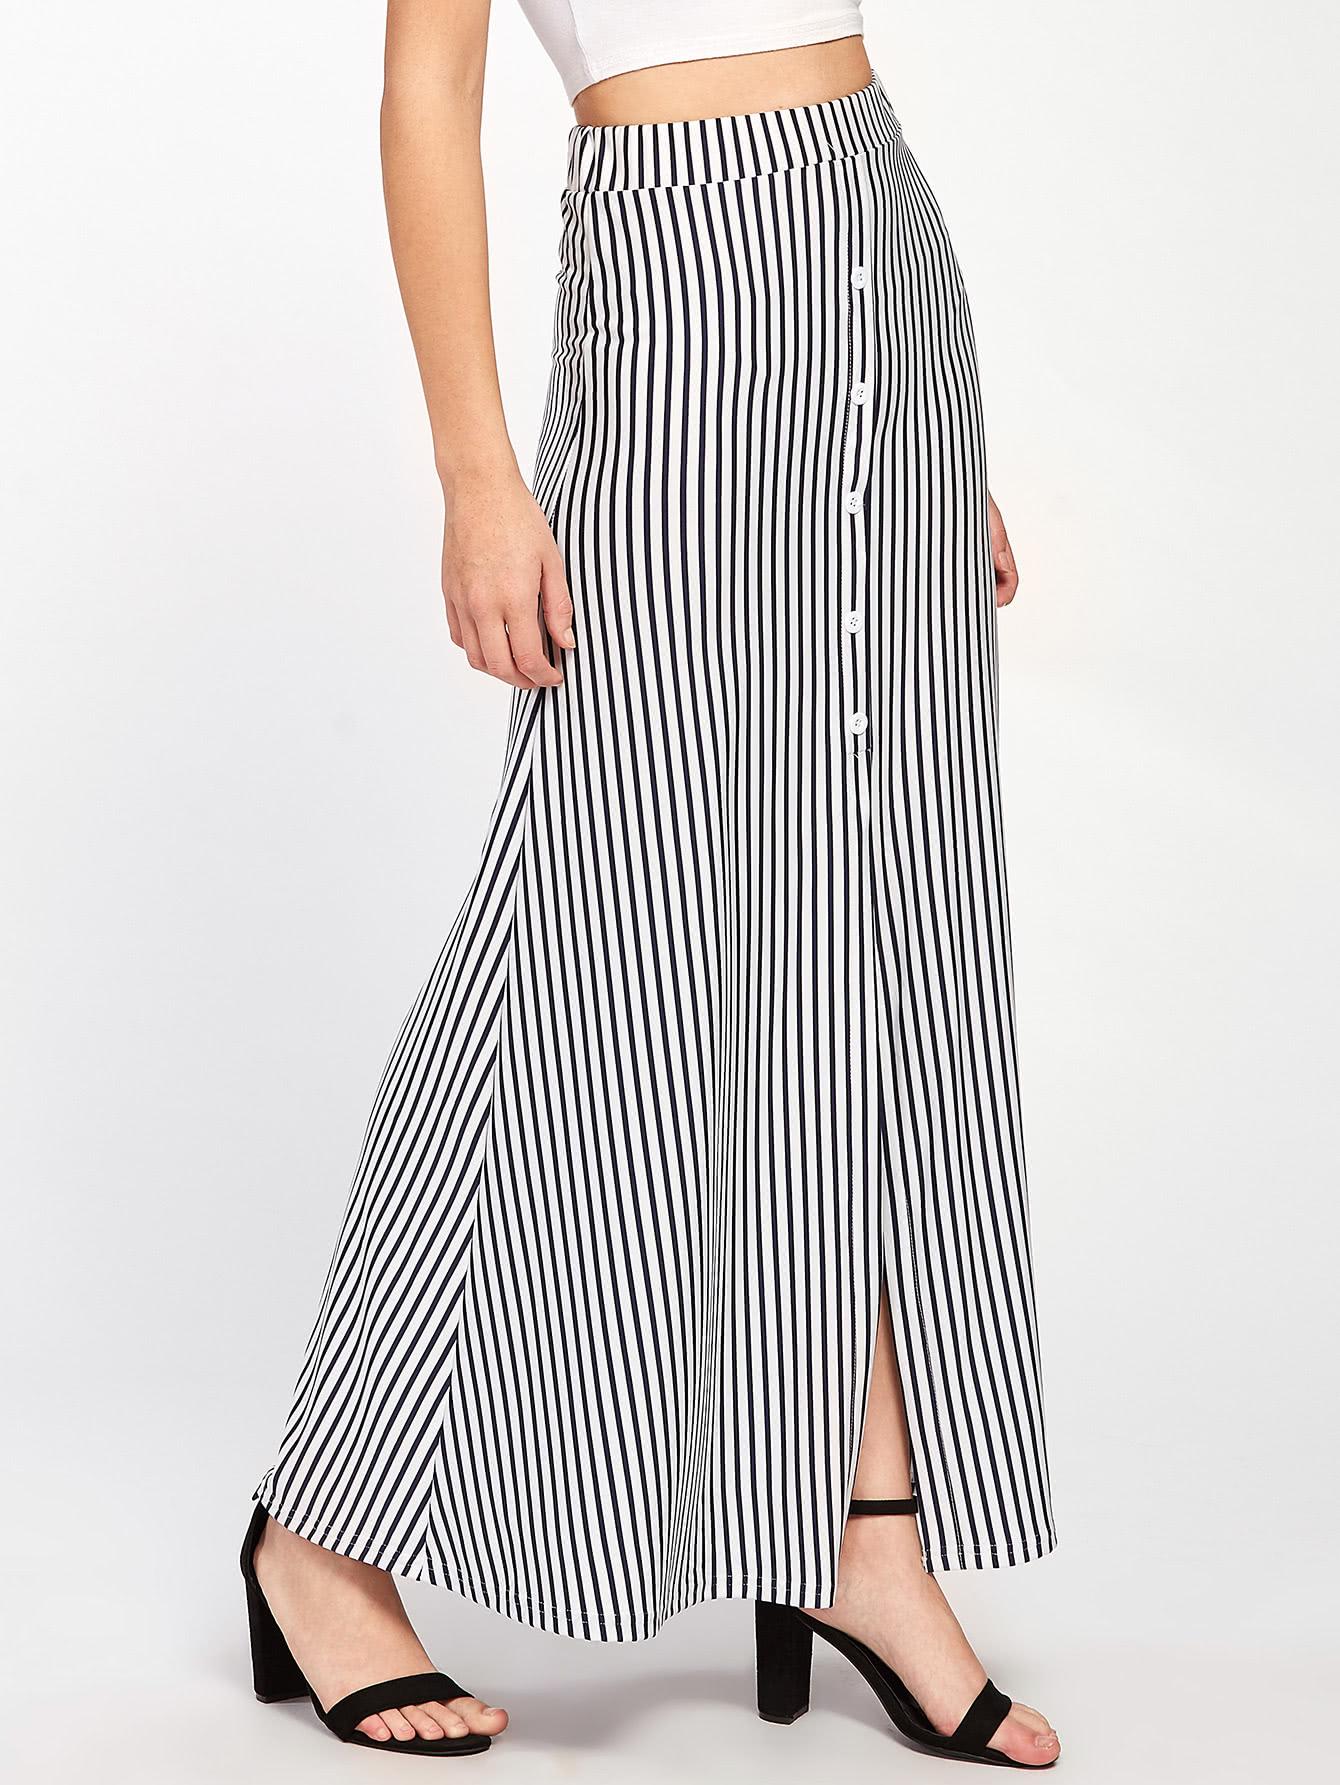 Vertical Striped Button Front Skirt